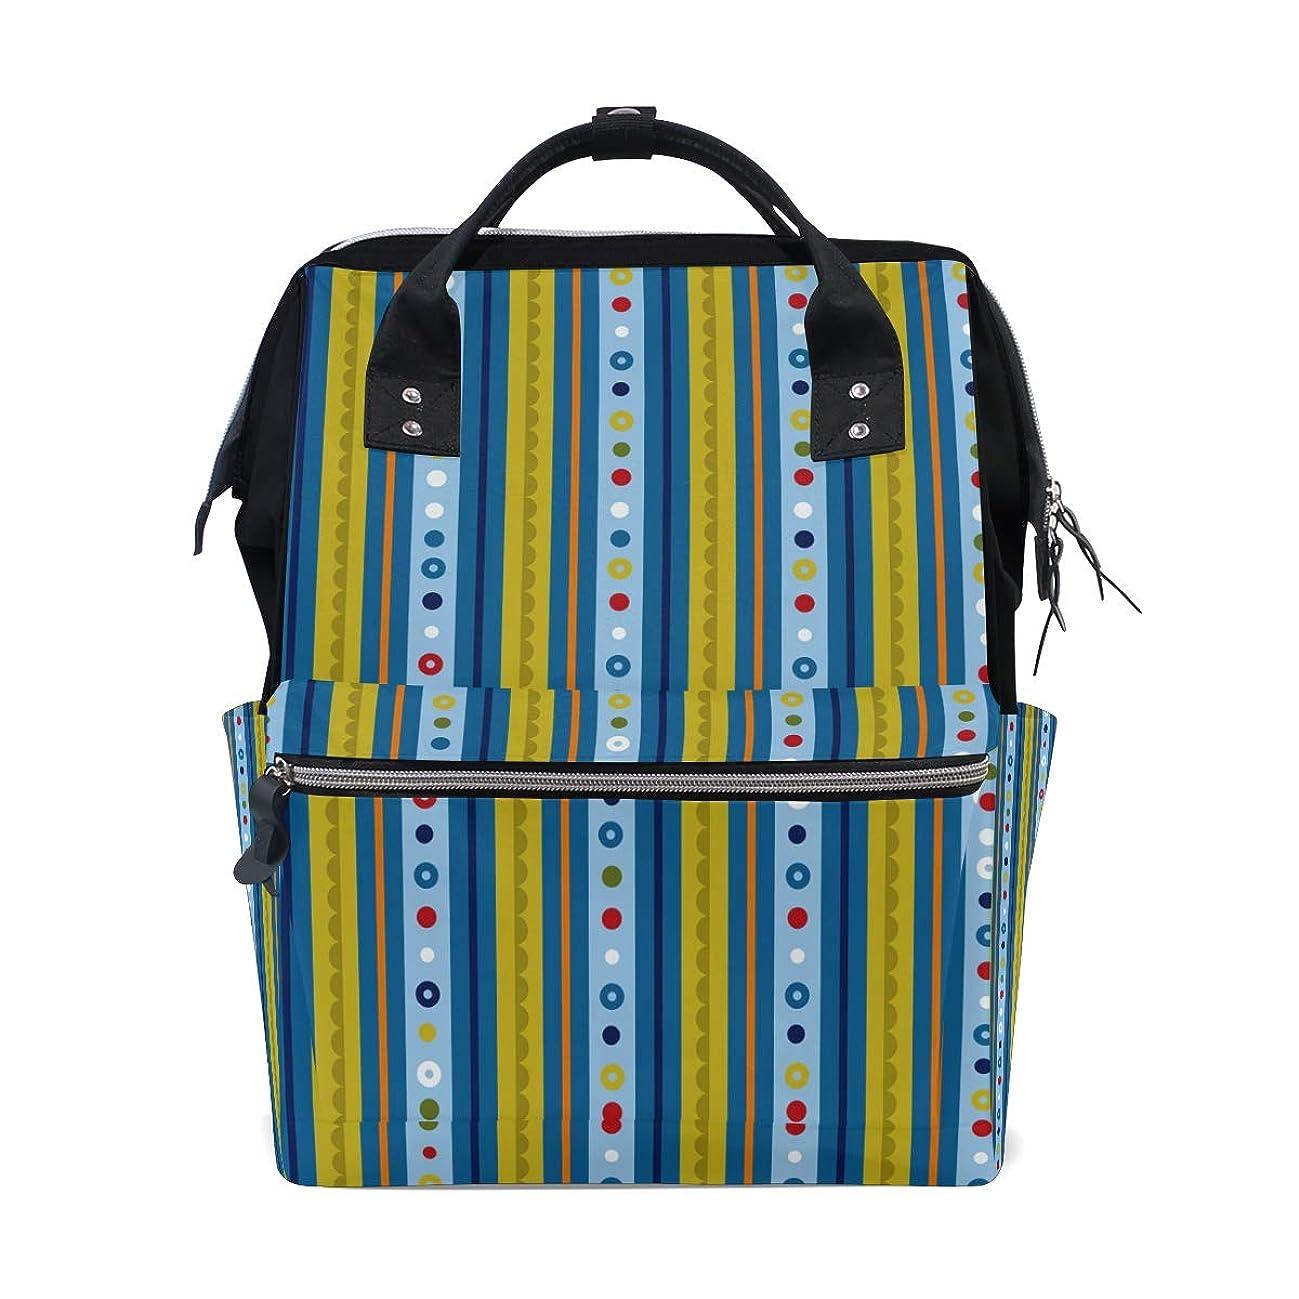 Blue Yellow Vertical Striped Pattern School Backpack Large Capacity Mummy Bags Laptop Handbag Casual Travel Rucksack Satchel For Women Men Adult Teen Children